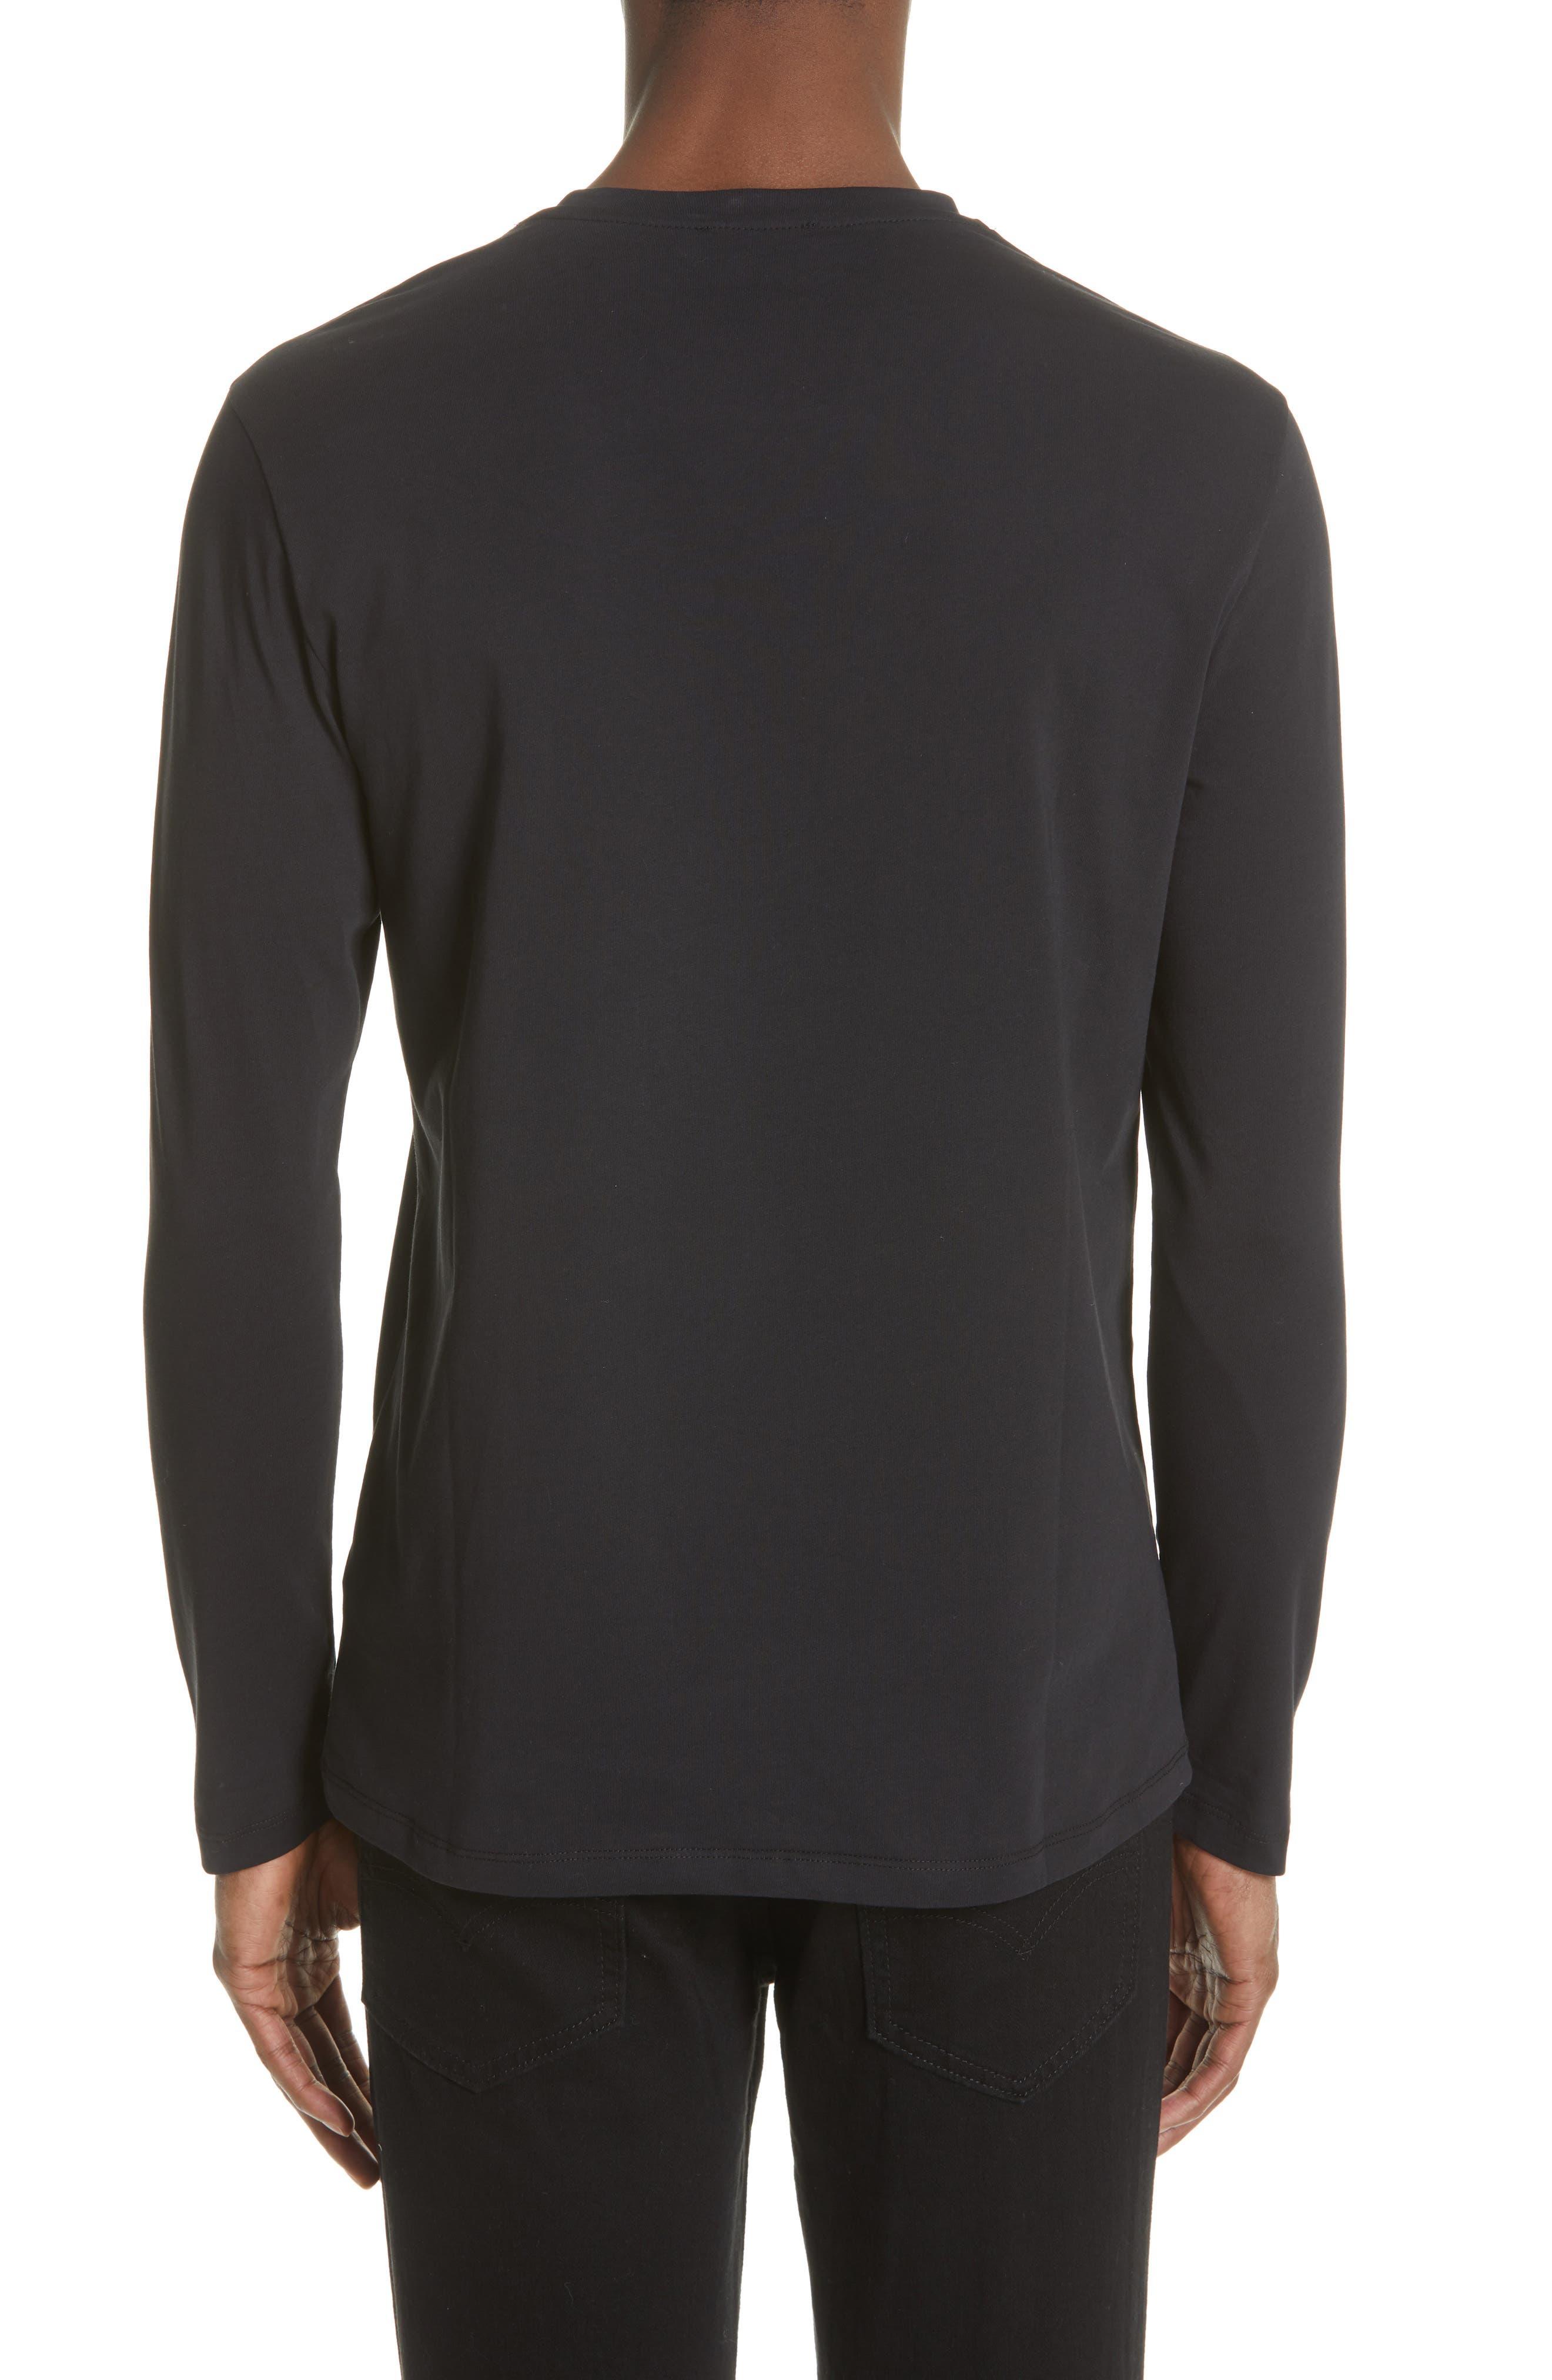 VERSACE COLLECTION,                             Medusa Long Sleeve T-Shirt,                             Alternate thumbnail 2, color,                             BLACK